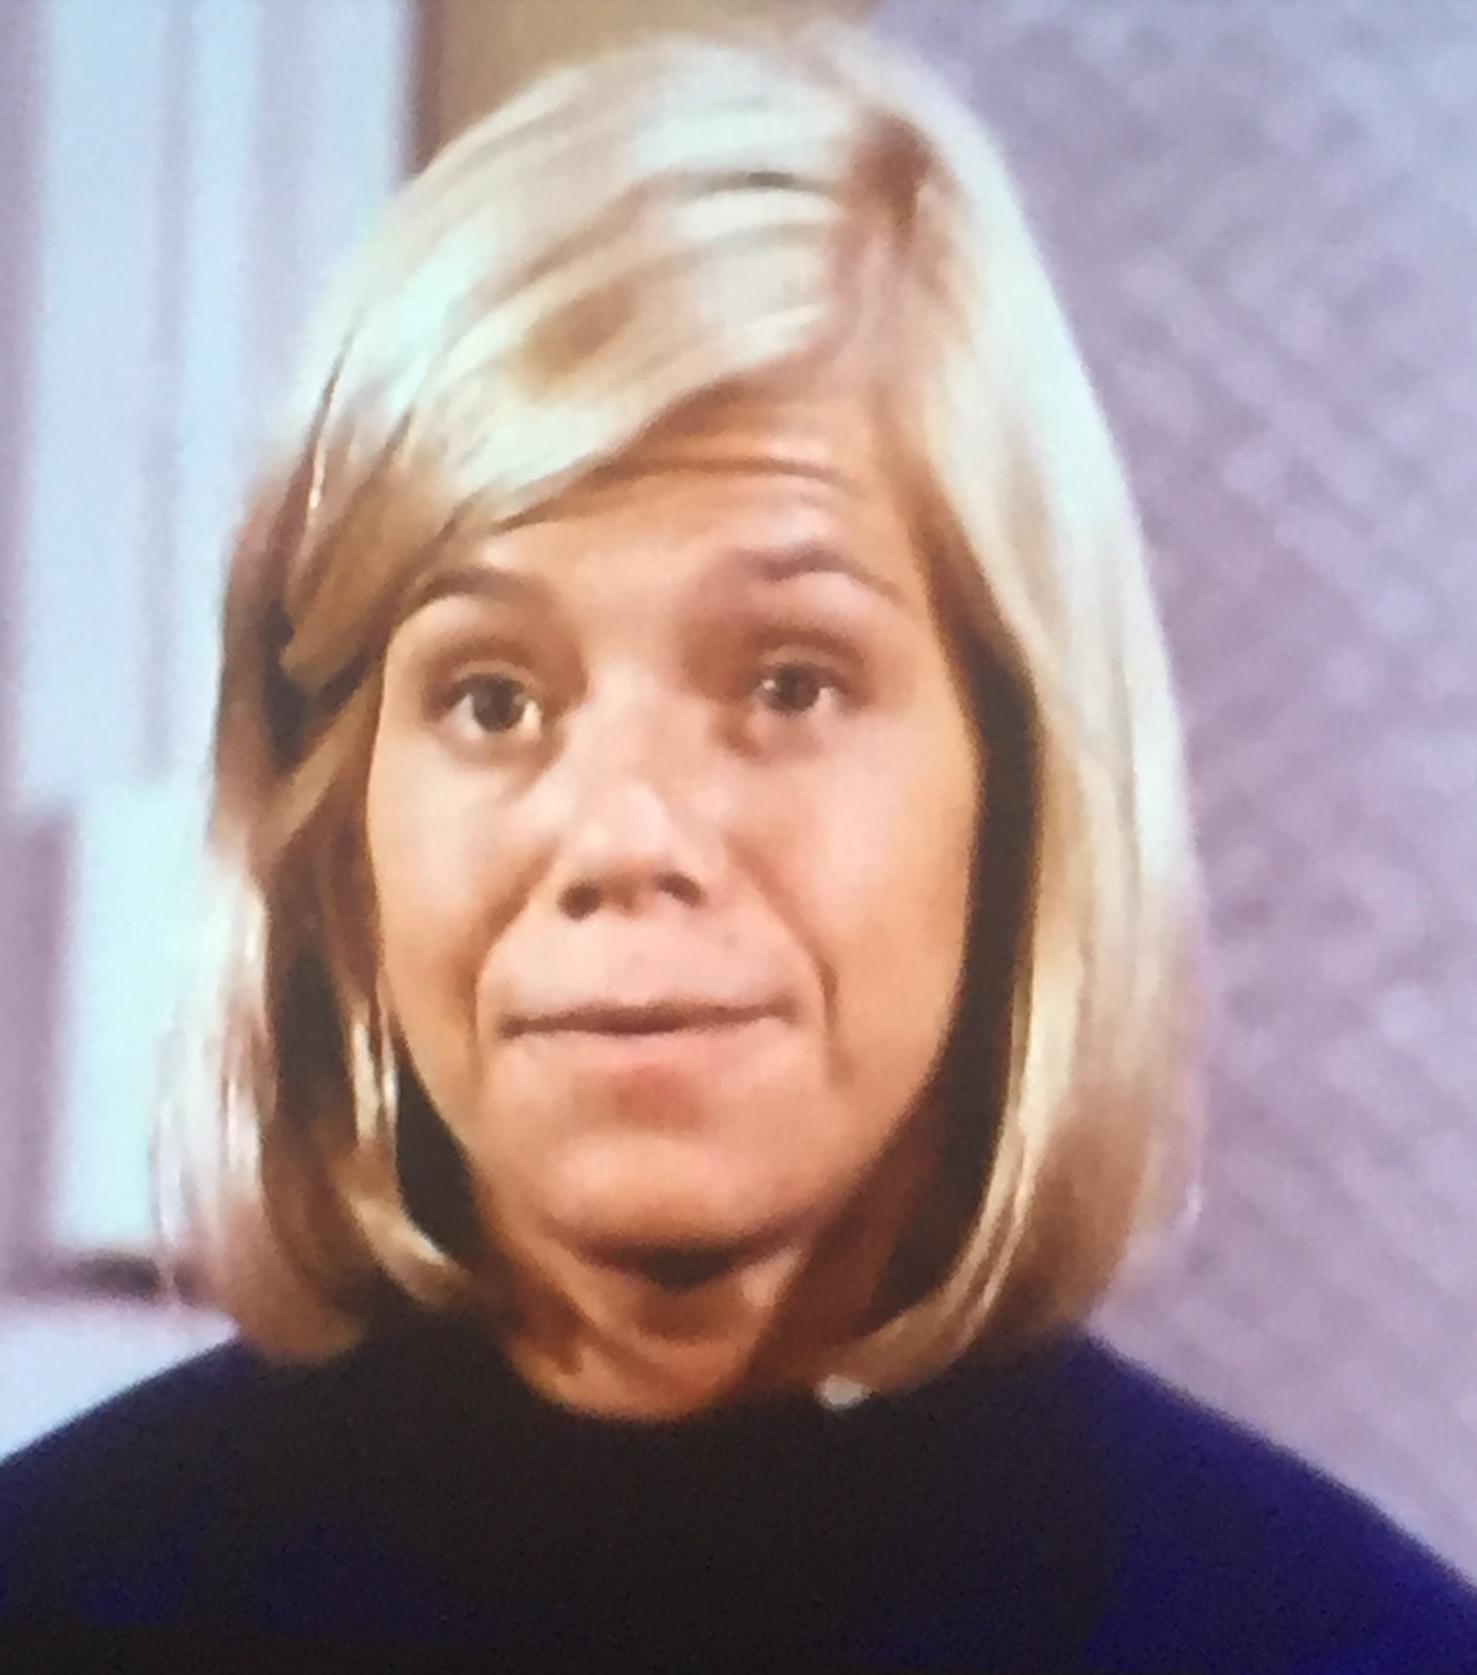 Сериал «Комната 222» (1969 – 1974): Николь Джаффе 2 сезон, 13 эпизод — «What Would We Do Without Bobbie?» 1477x1675